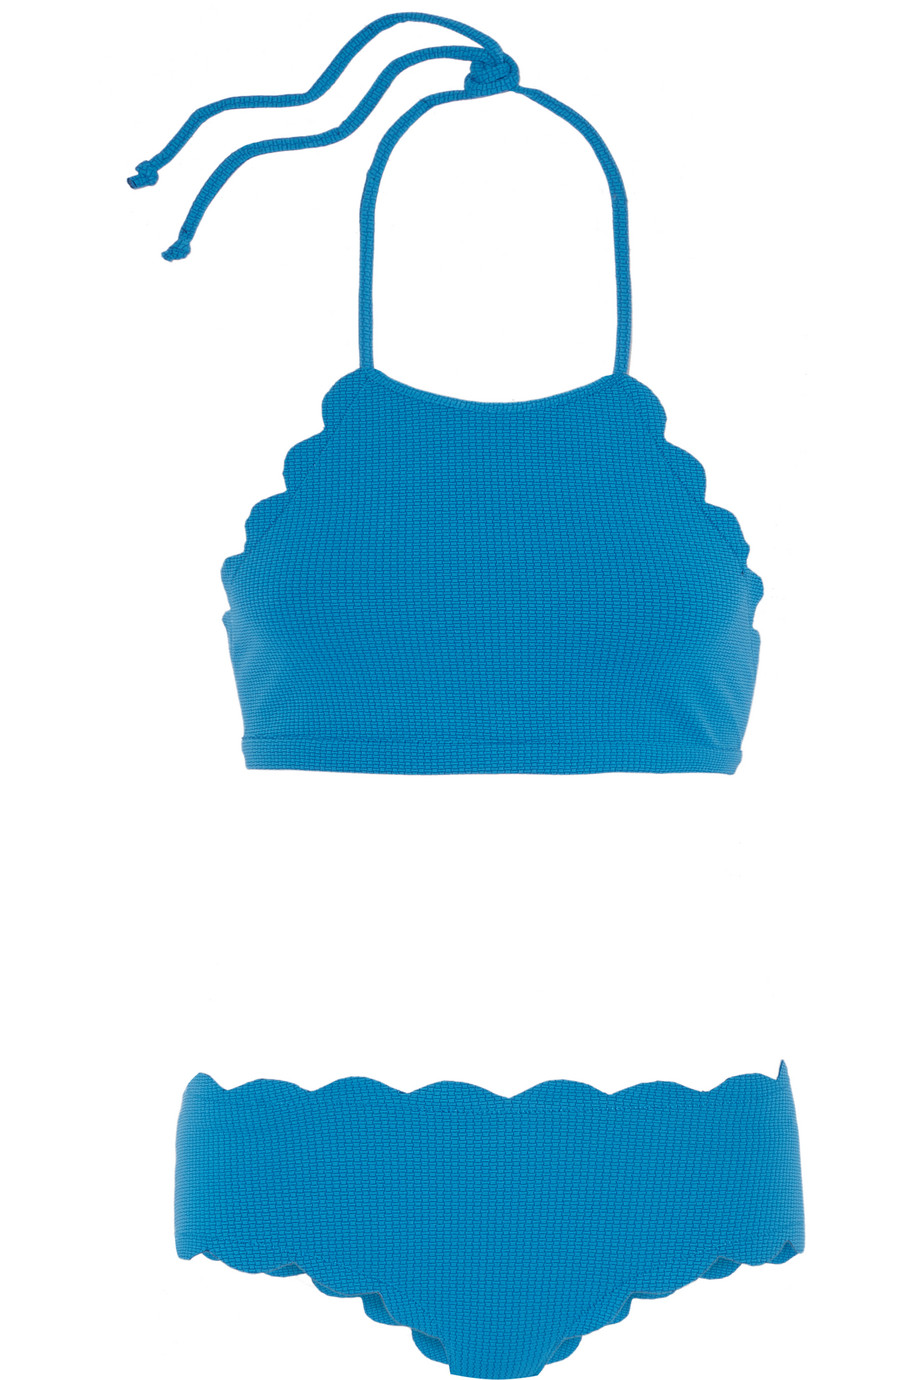 Marysia Mott Scalloped Halterneck Bikini, Bright Blue, Women's, Size: L